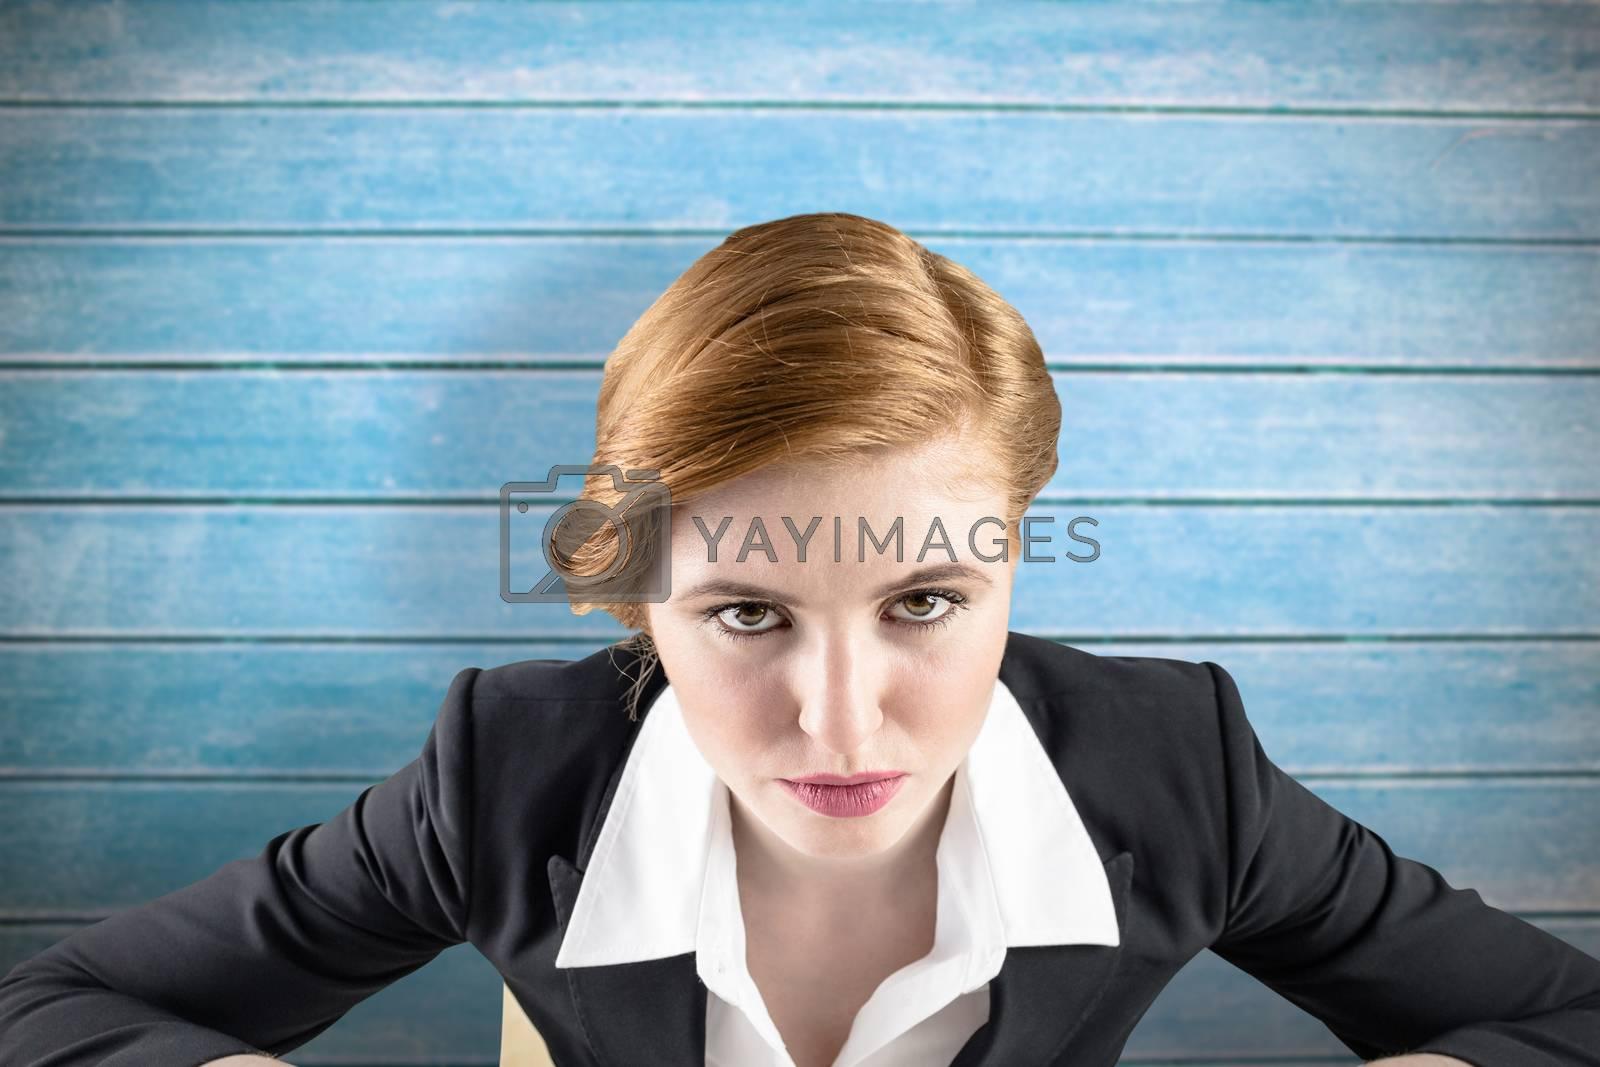 Focused businesswoman against wooden planks